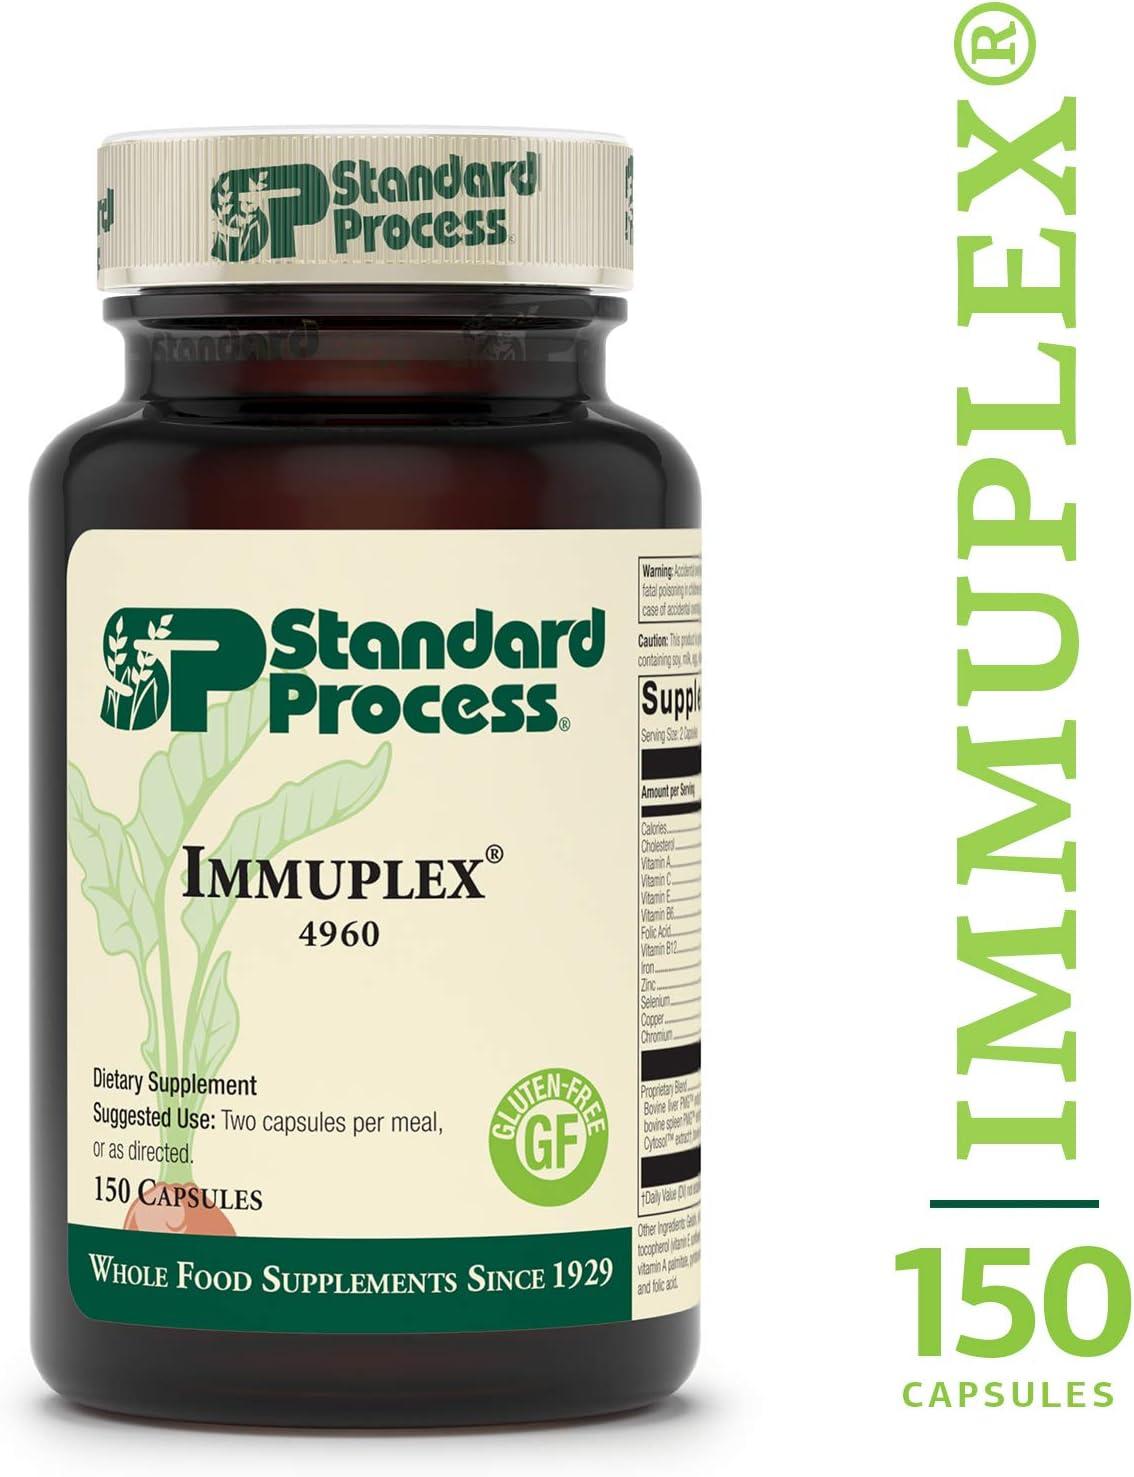 Standard Process – Immuplex – Immune System Function Support Supplement, Provides Vitamin A, C, E, B6, B12, Folic Acid, Iron, Zinc, Selenium, Copper, Chromium, Gluten Free – 150 Capsules